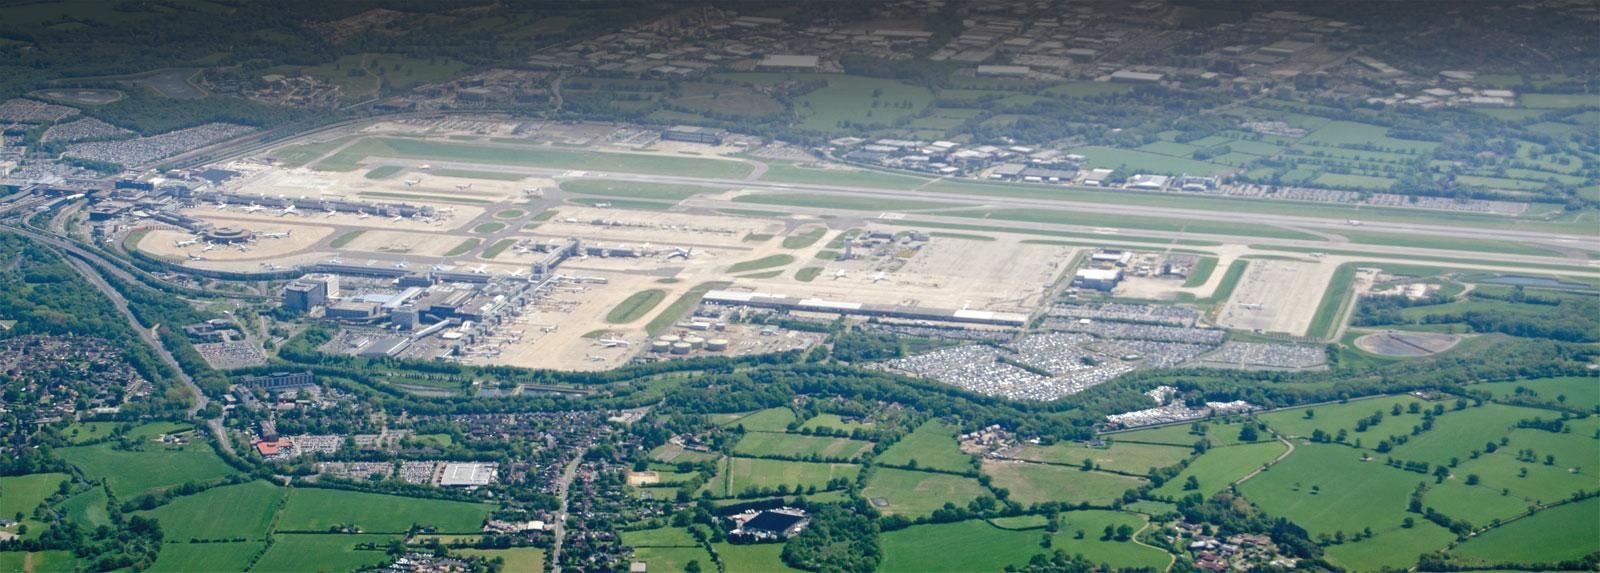 Car hire Gatwick Airport